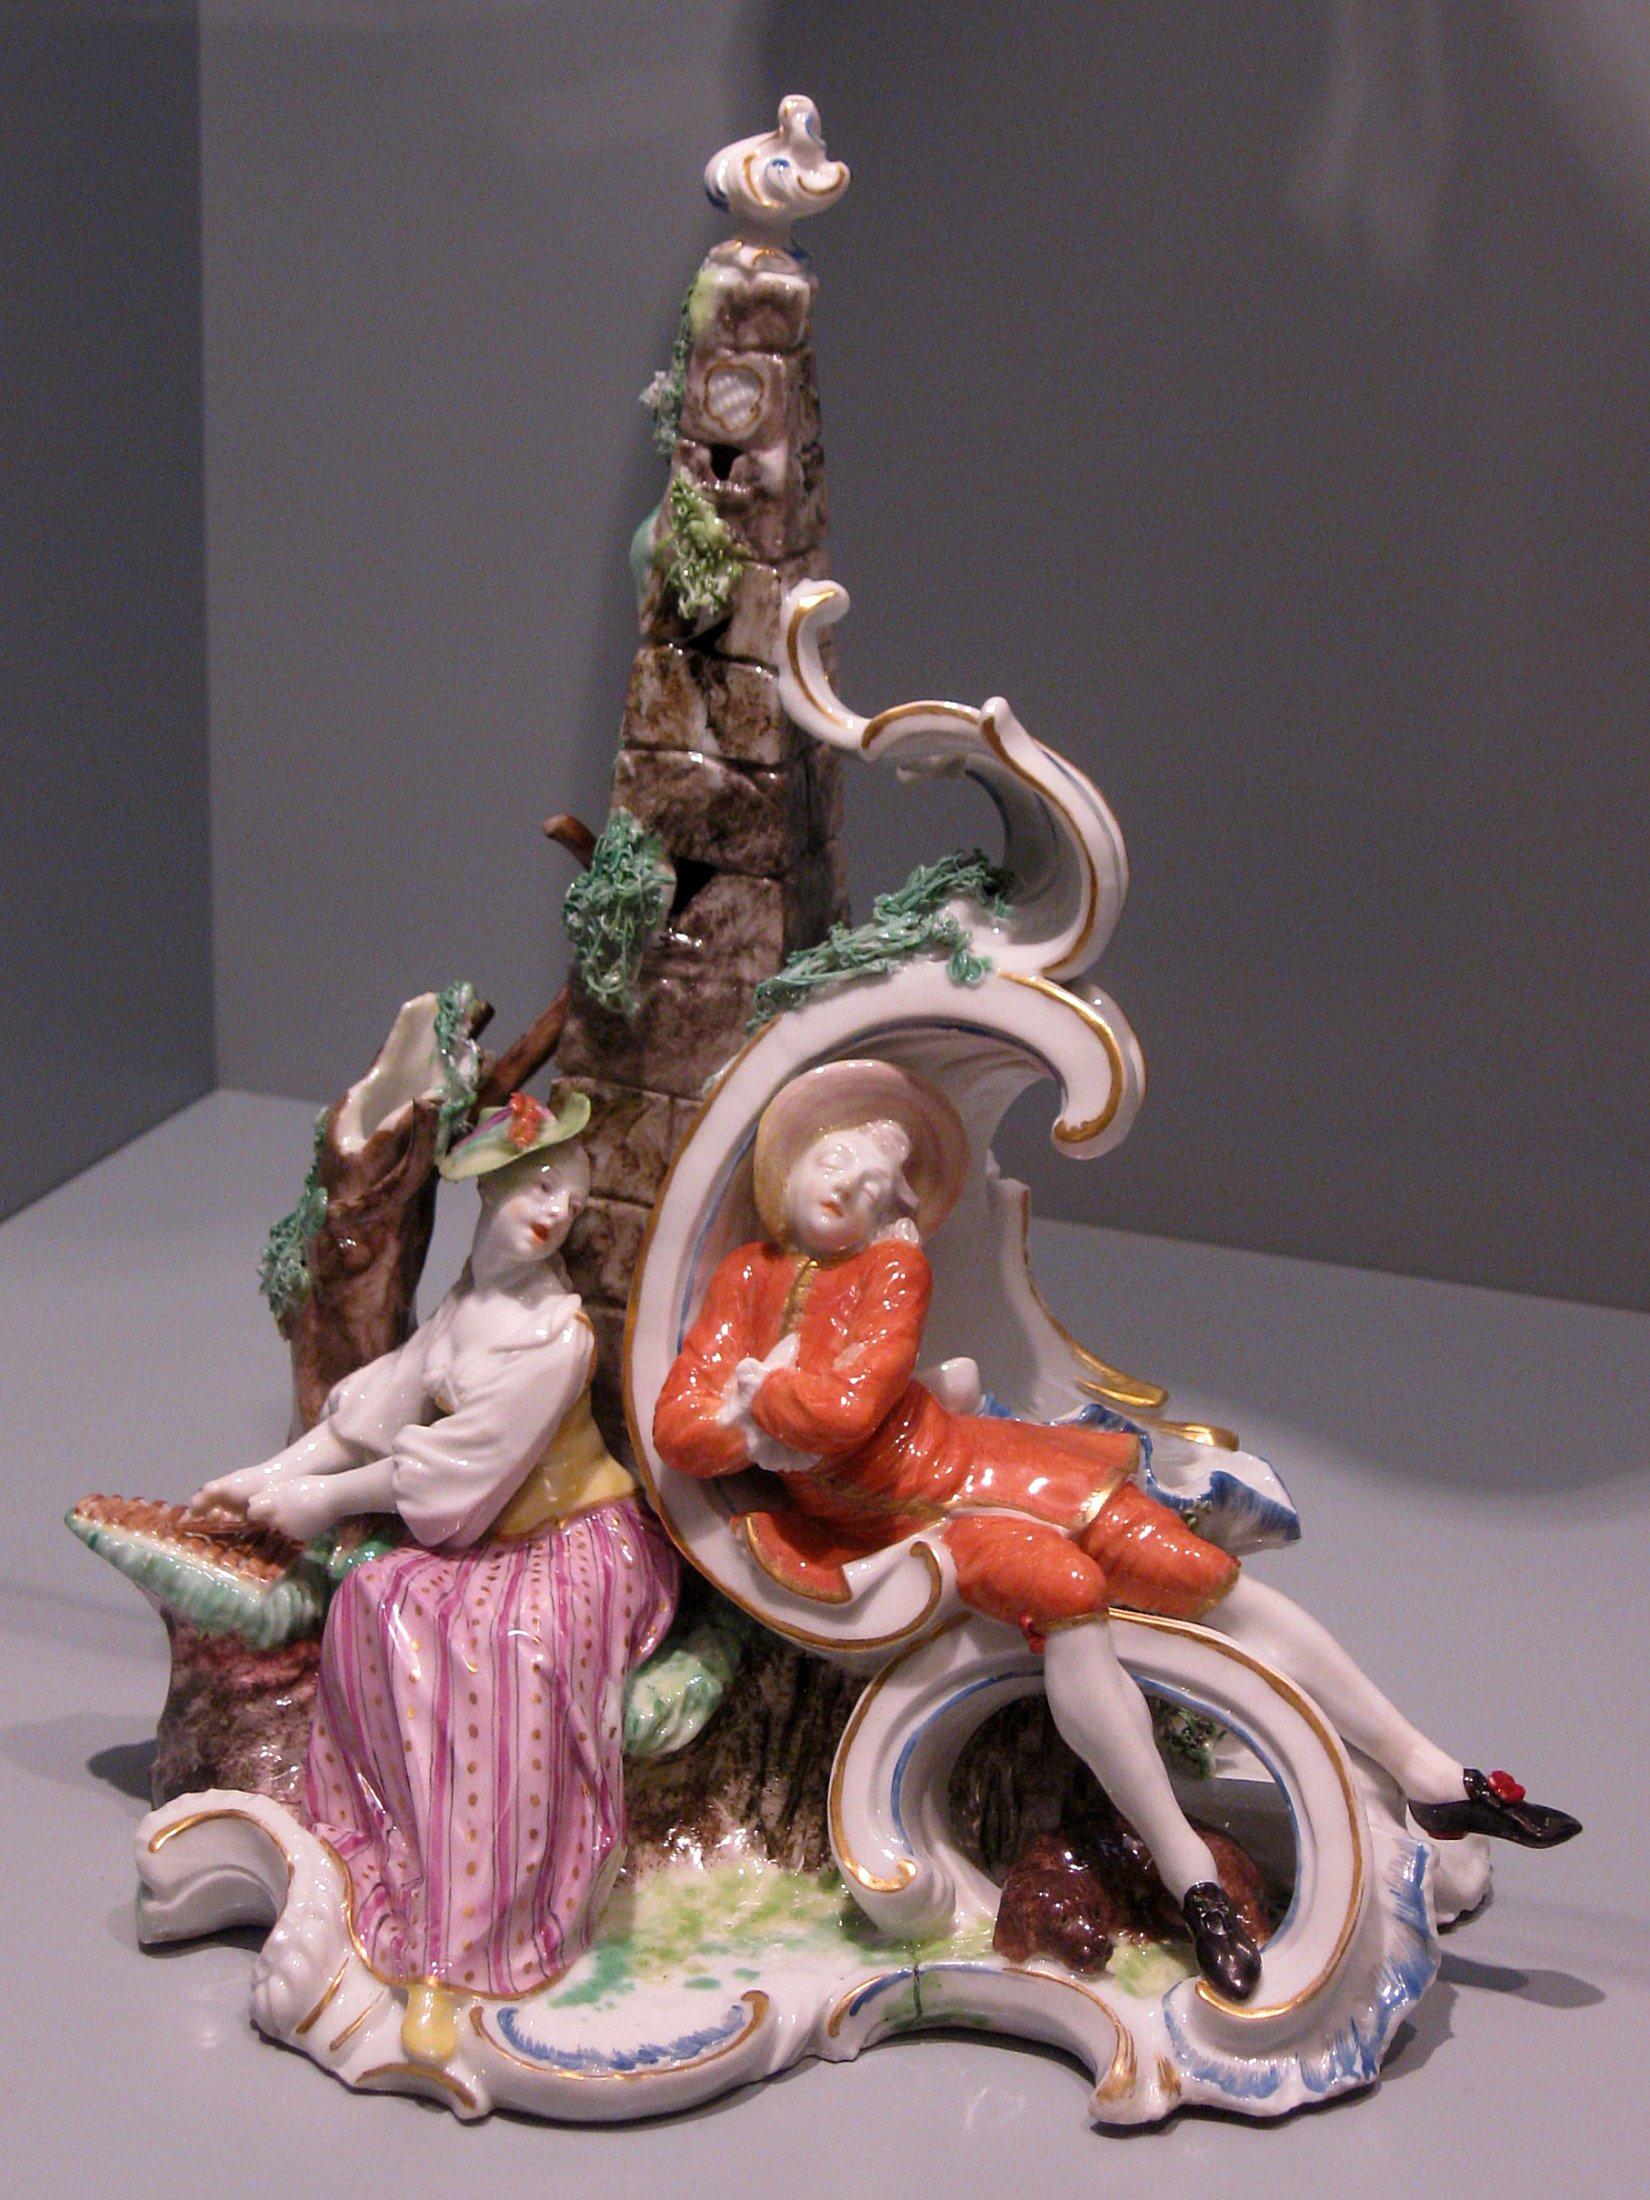 Porcelaine Objet Decoratif